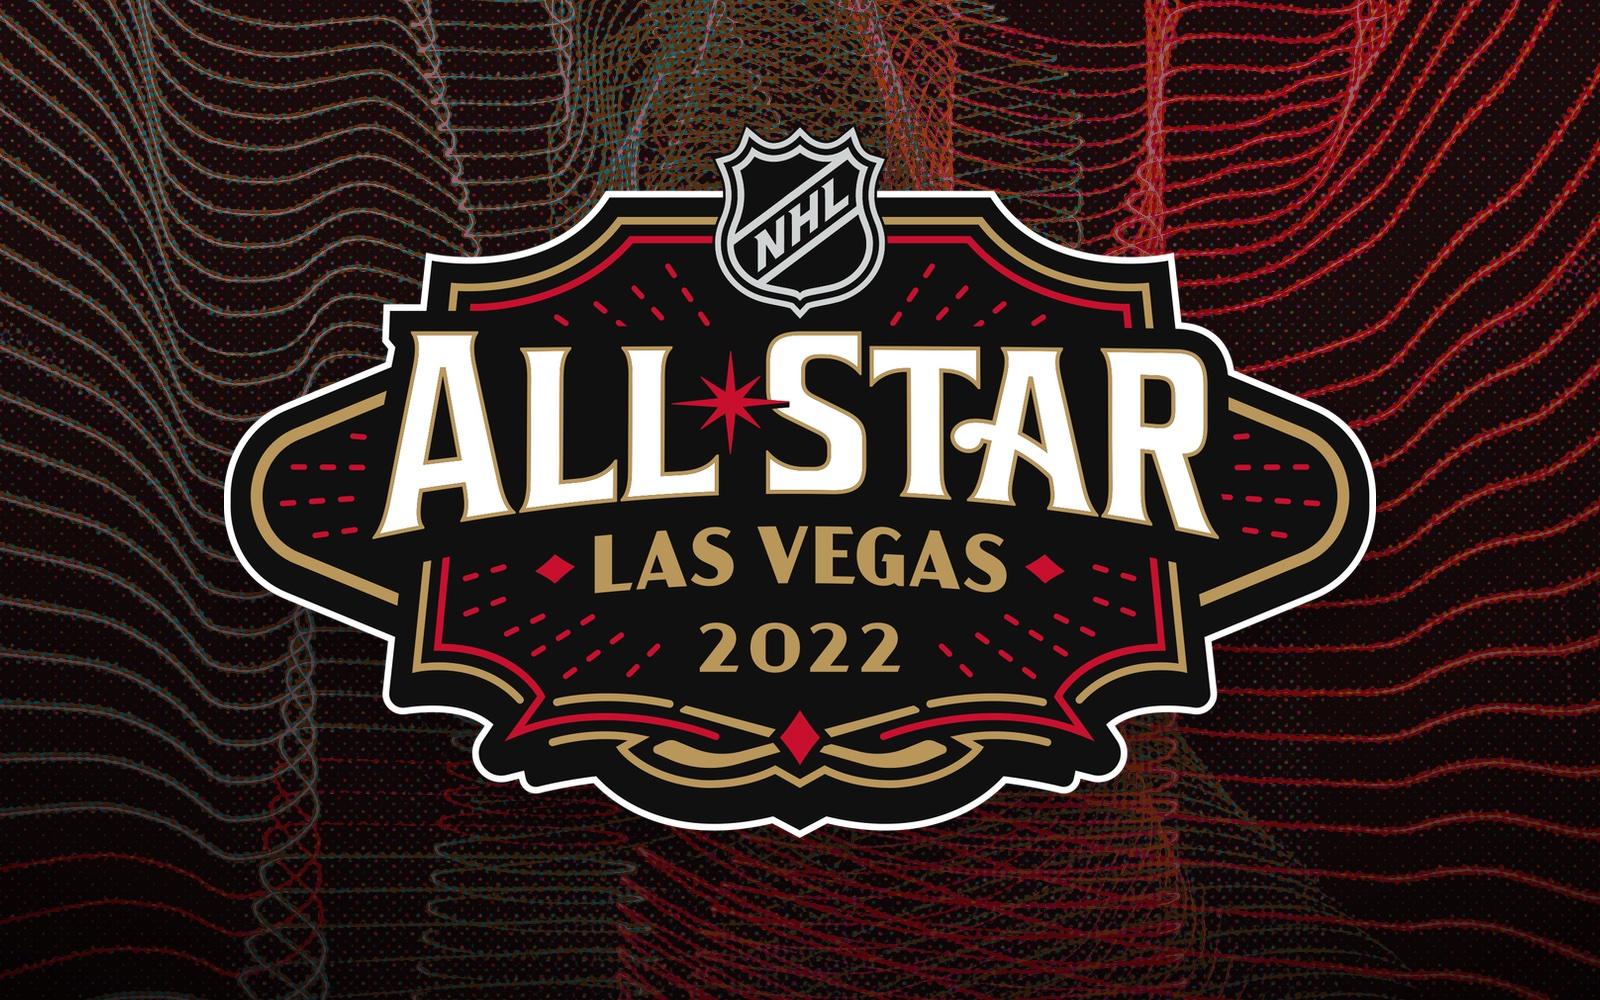 2022 NHL All-Star logo unveiled